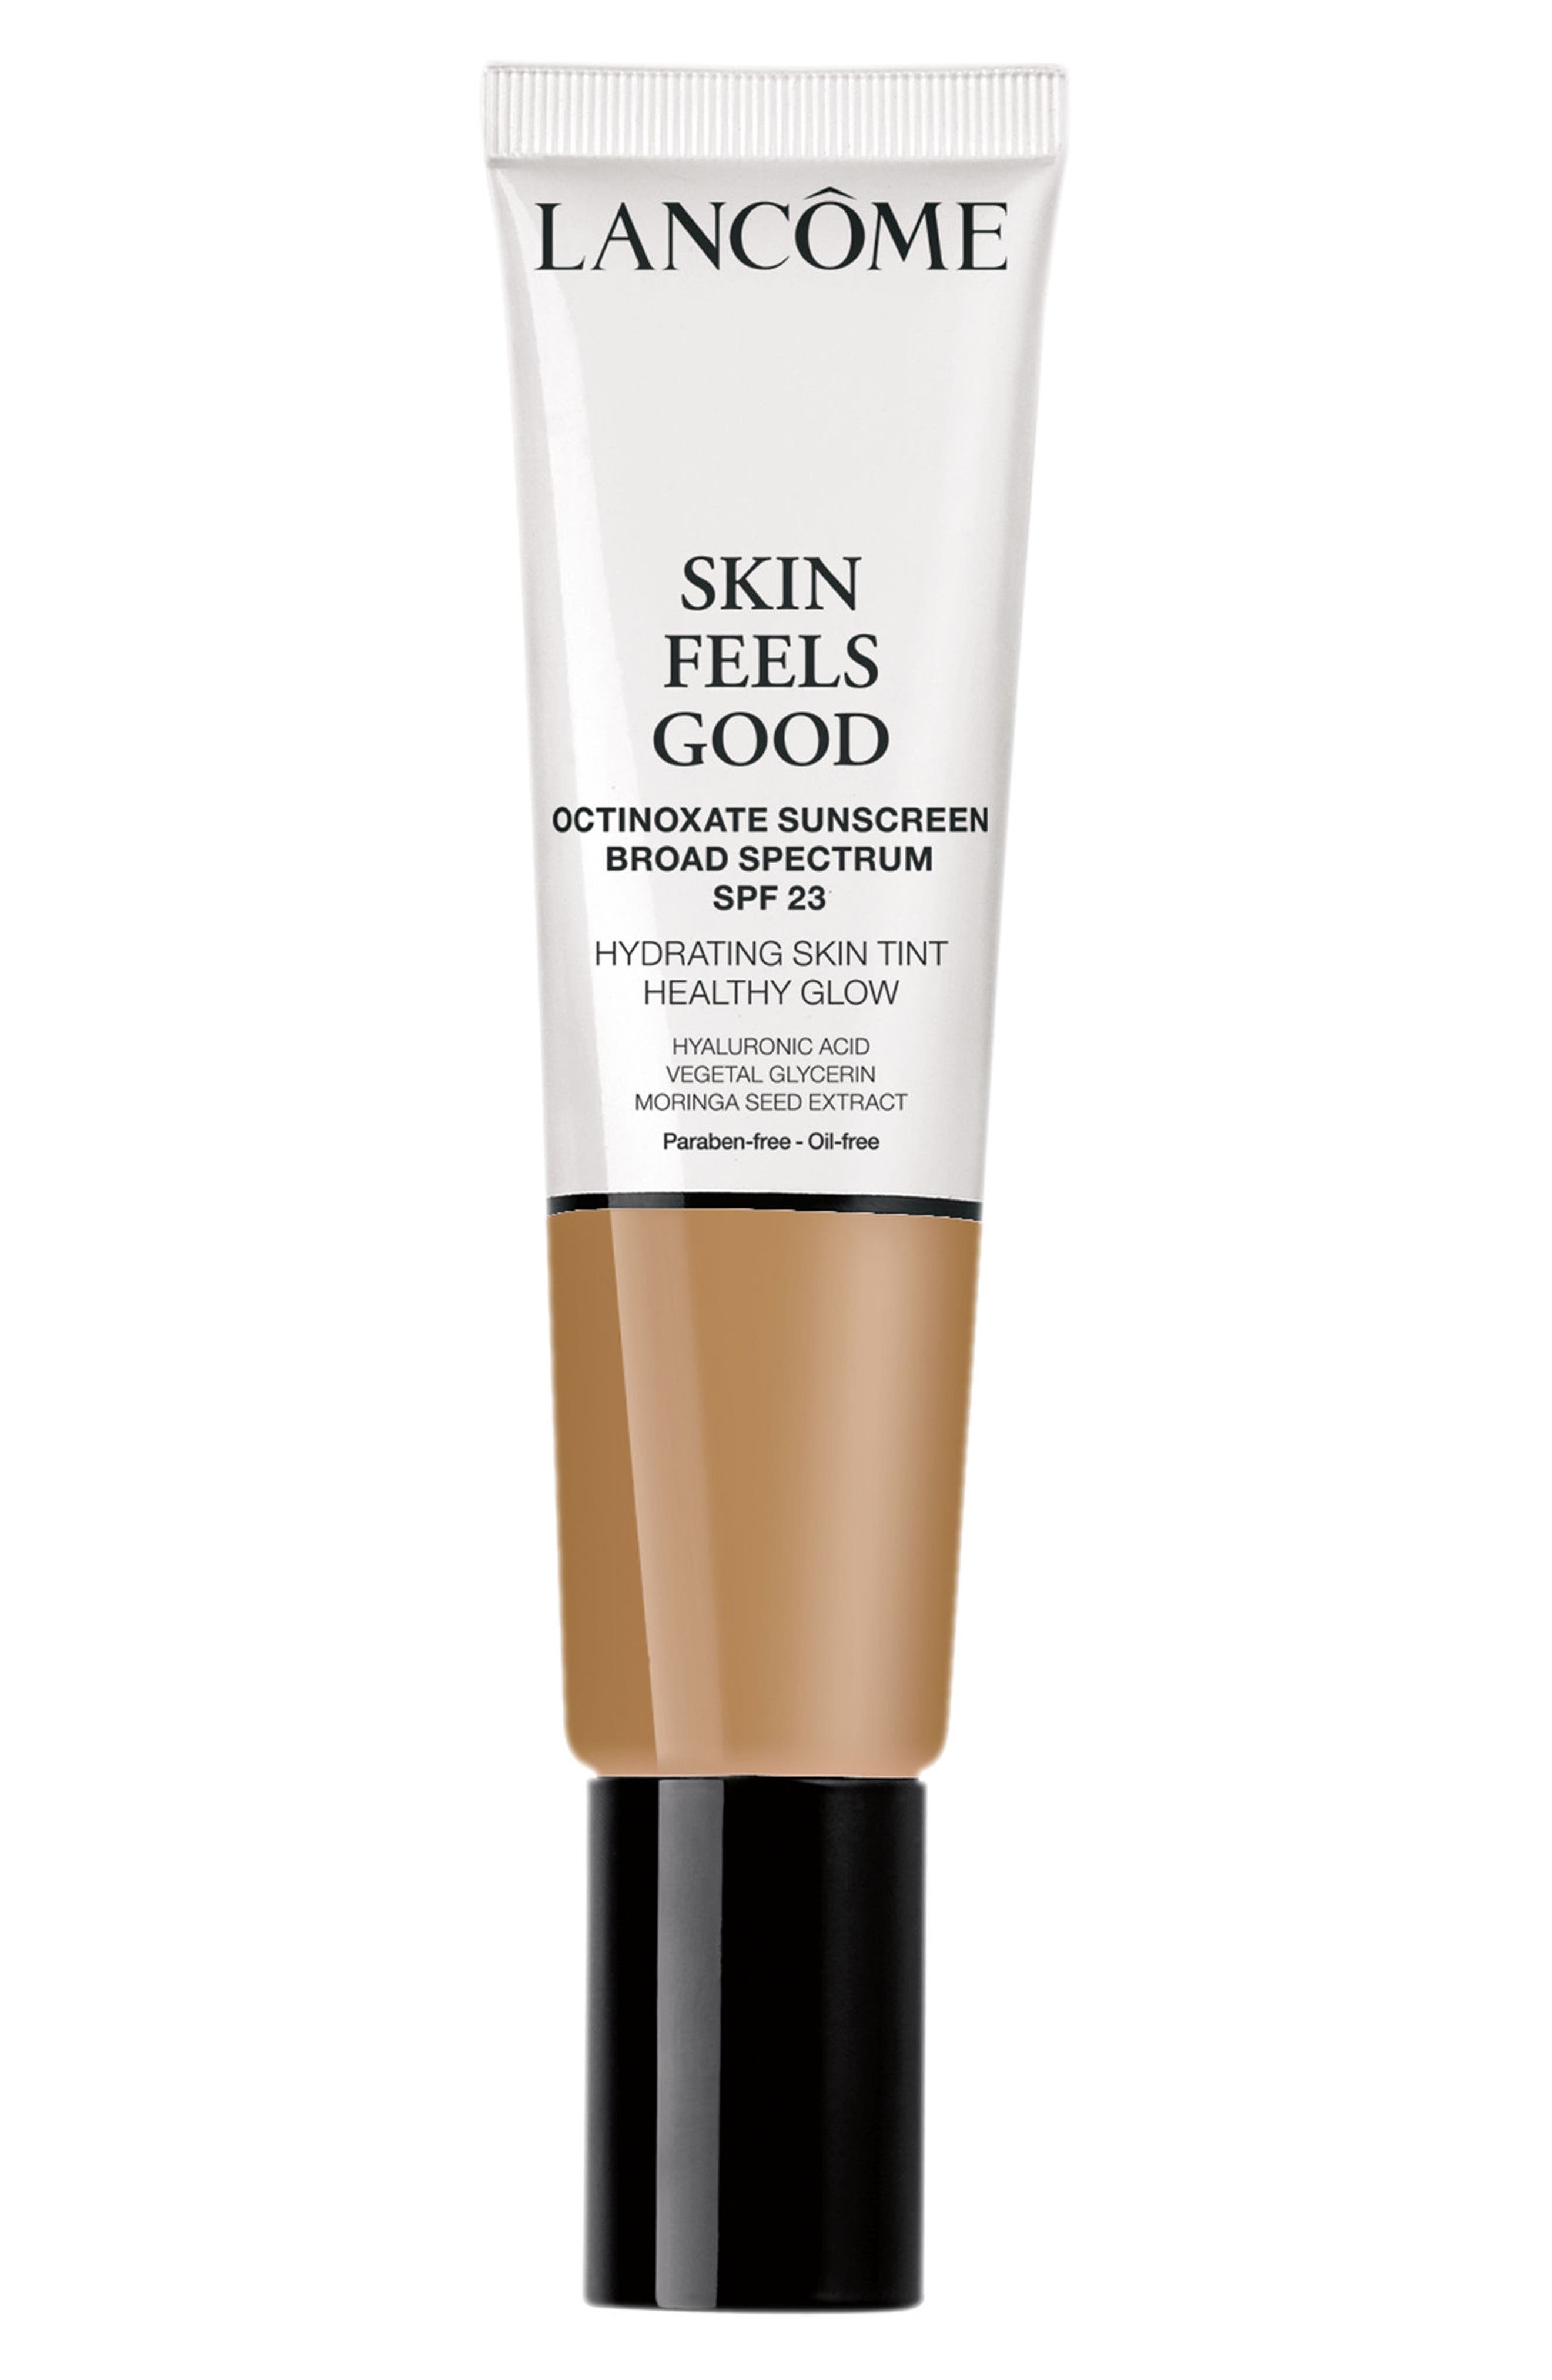 LANCÔME, Skin Feels Good Hydrating Skin Tint Healthy Glow SPF 23, Main thumbnail 1, color, 05N RADIANT TAN